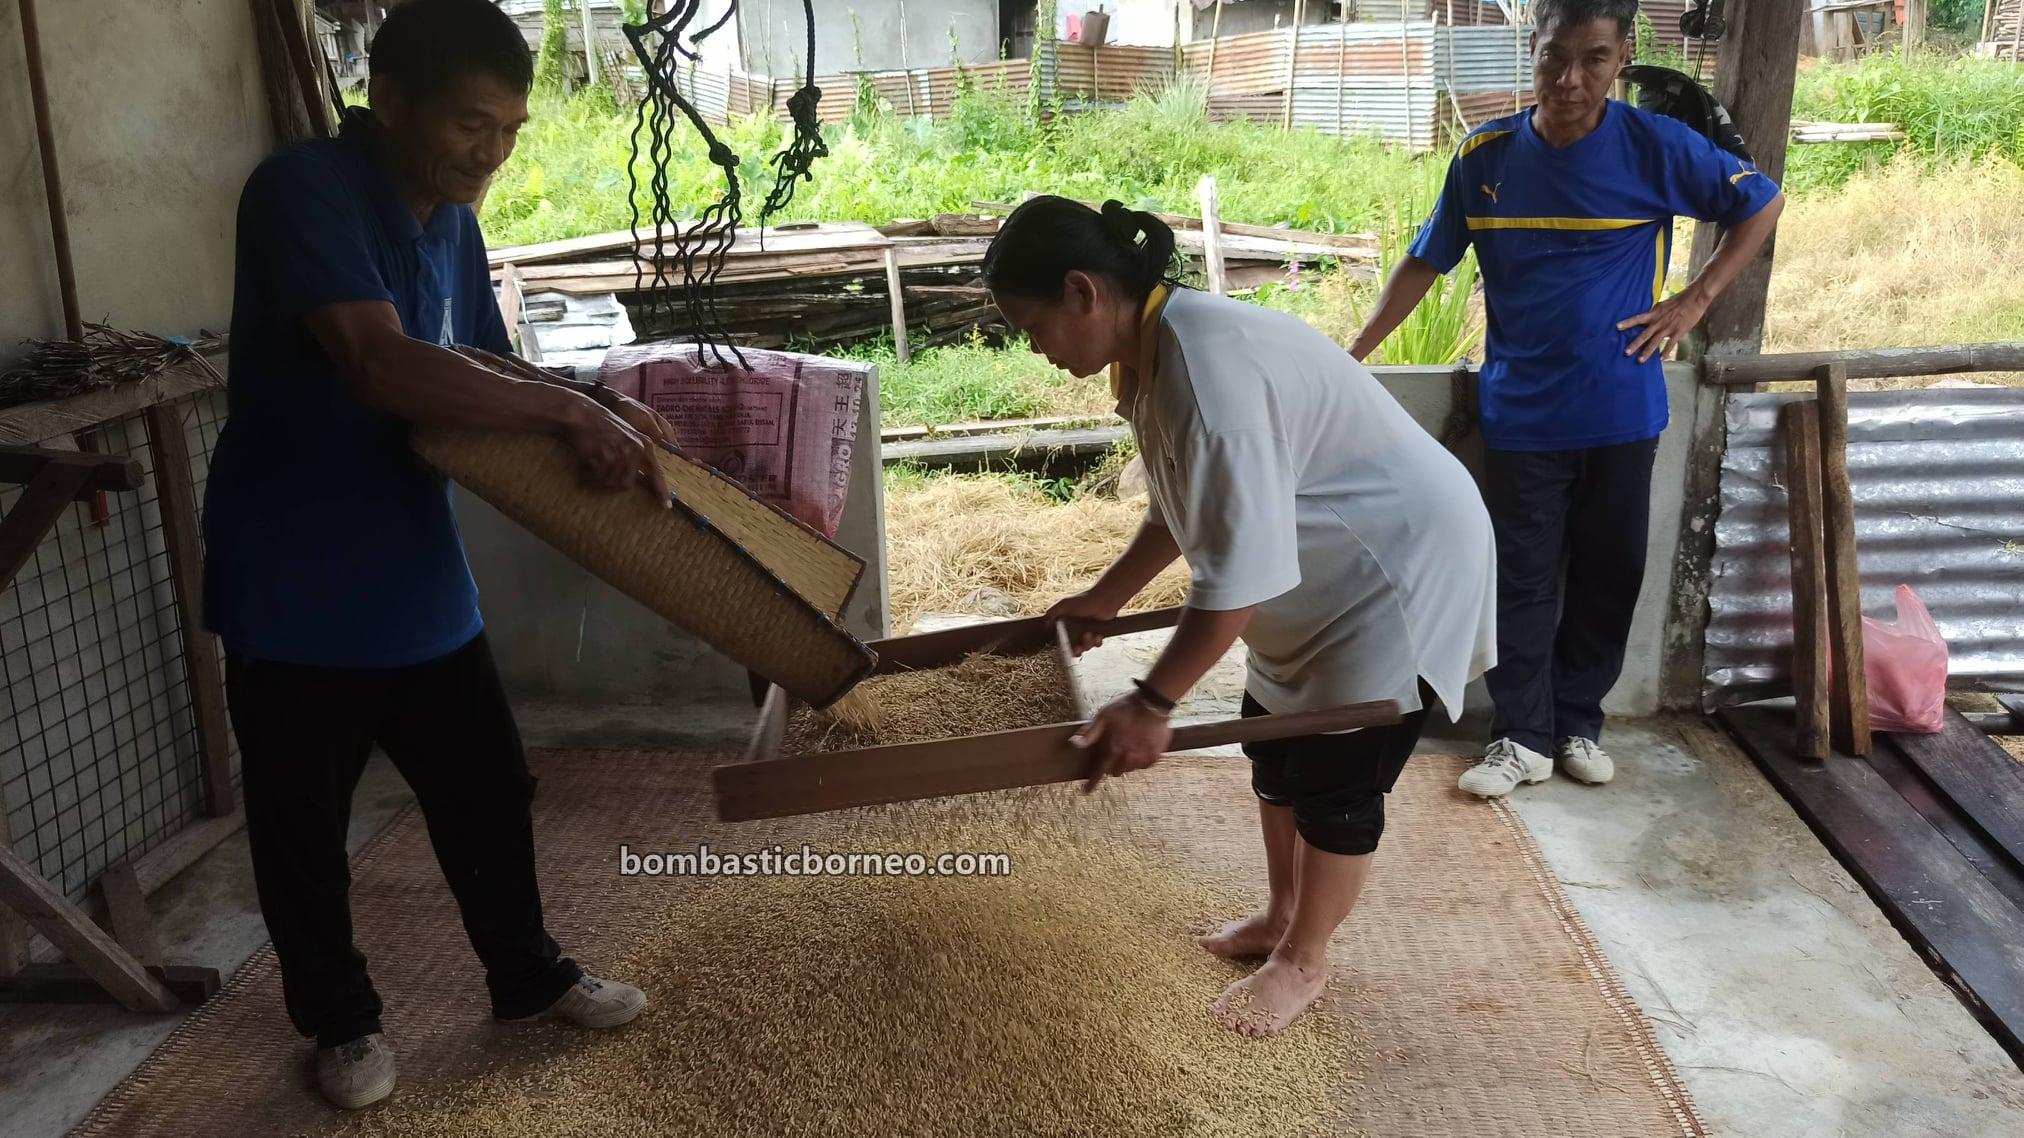 Paddy sieving, Kampung Gahat, Village, paddy farming, authentic, Traditional, dayak bidayuh, native, culture, Serian, Sarawak, Tourism, tourist attraction, travel guide, Borneo